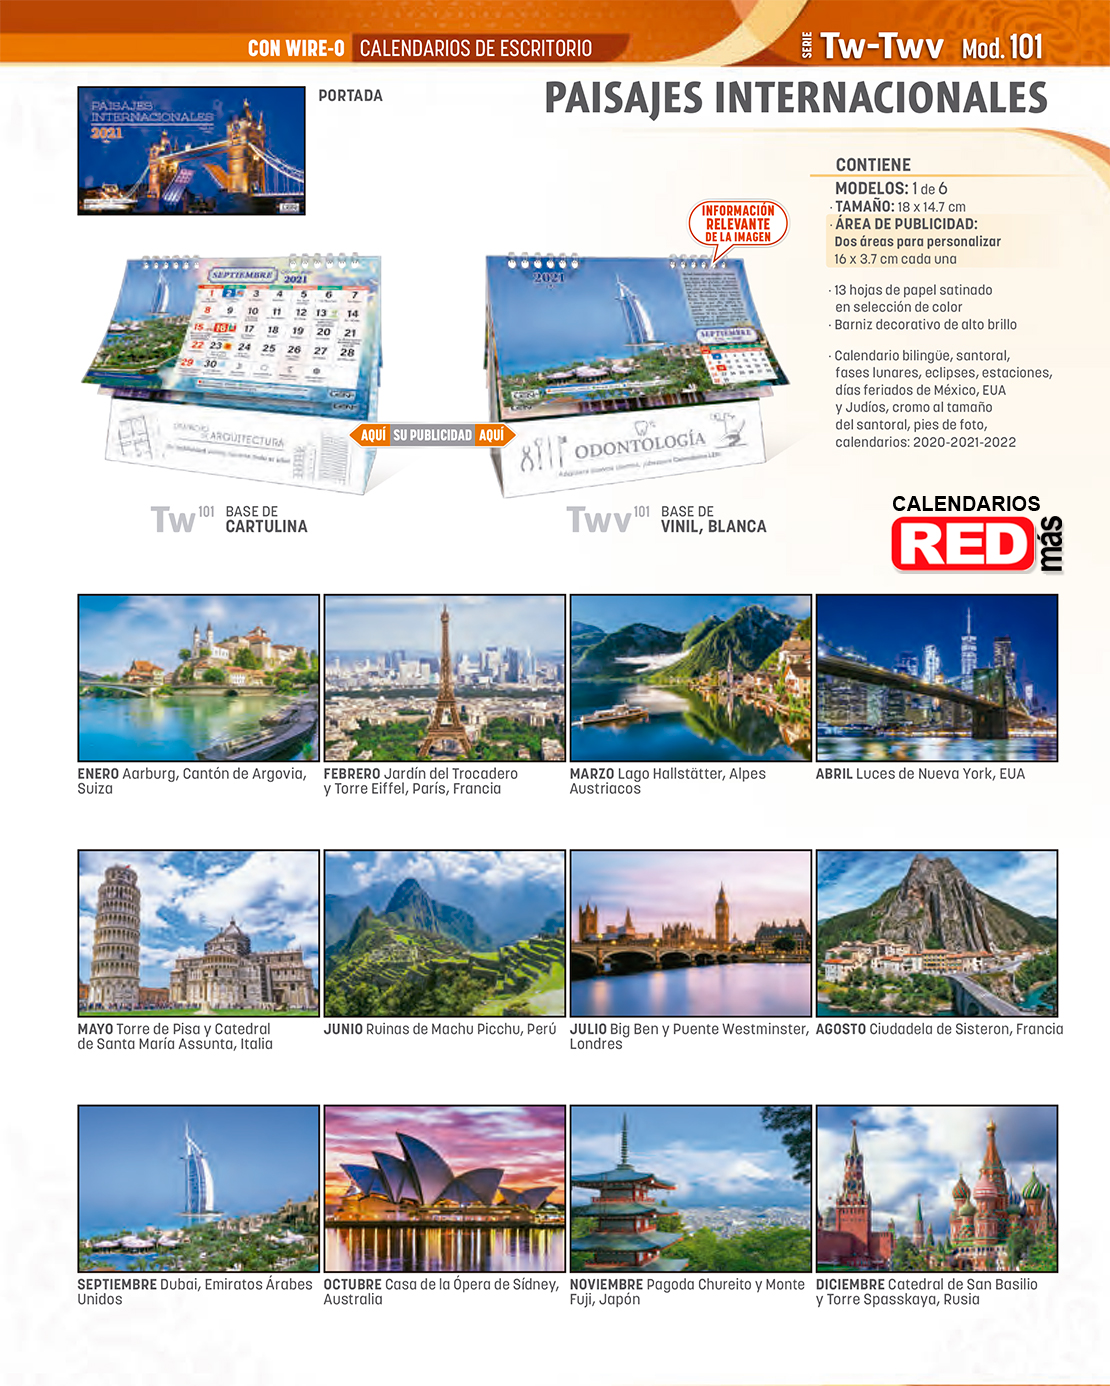 05-Catalogo-Calendarios-paisajes-internacionales-calendarios-red.jpg